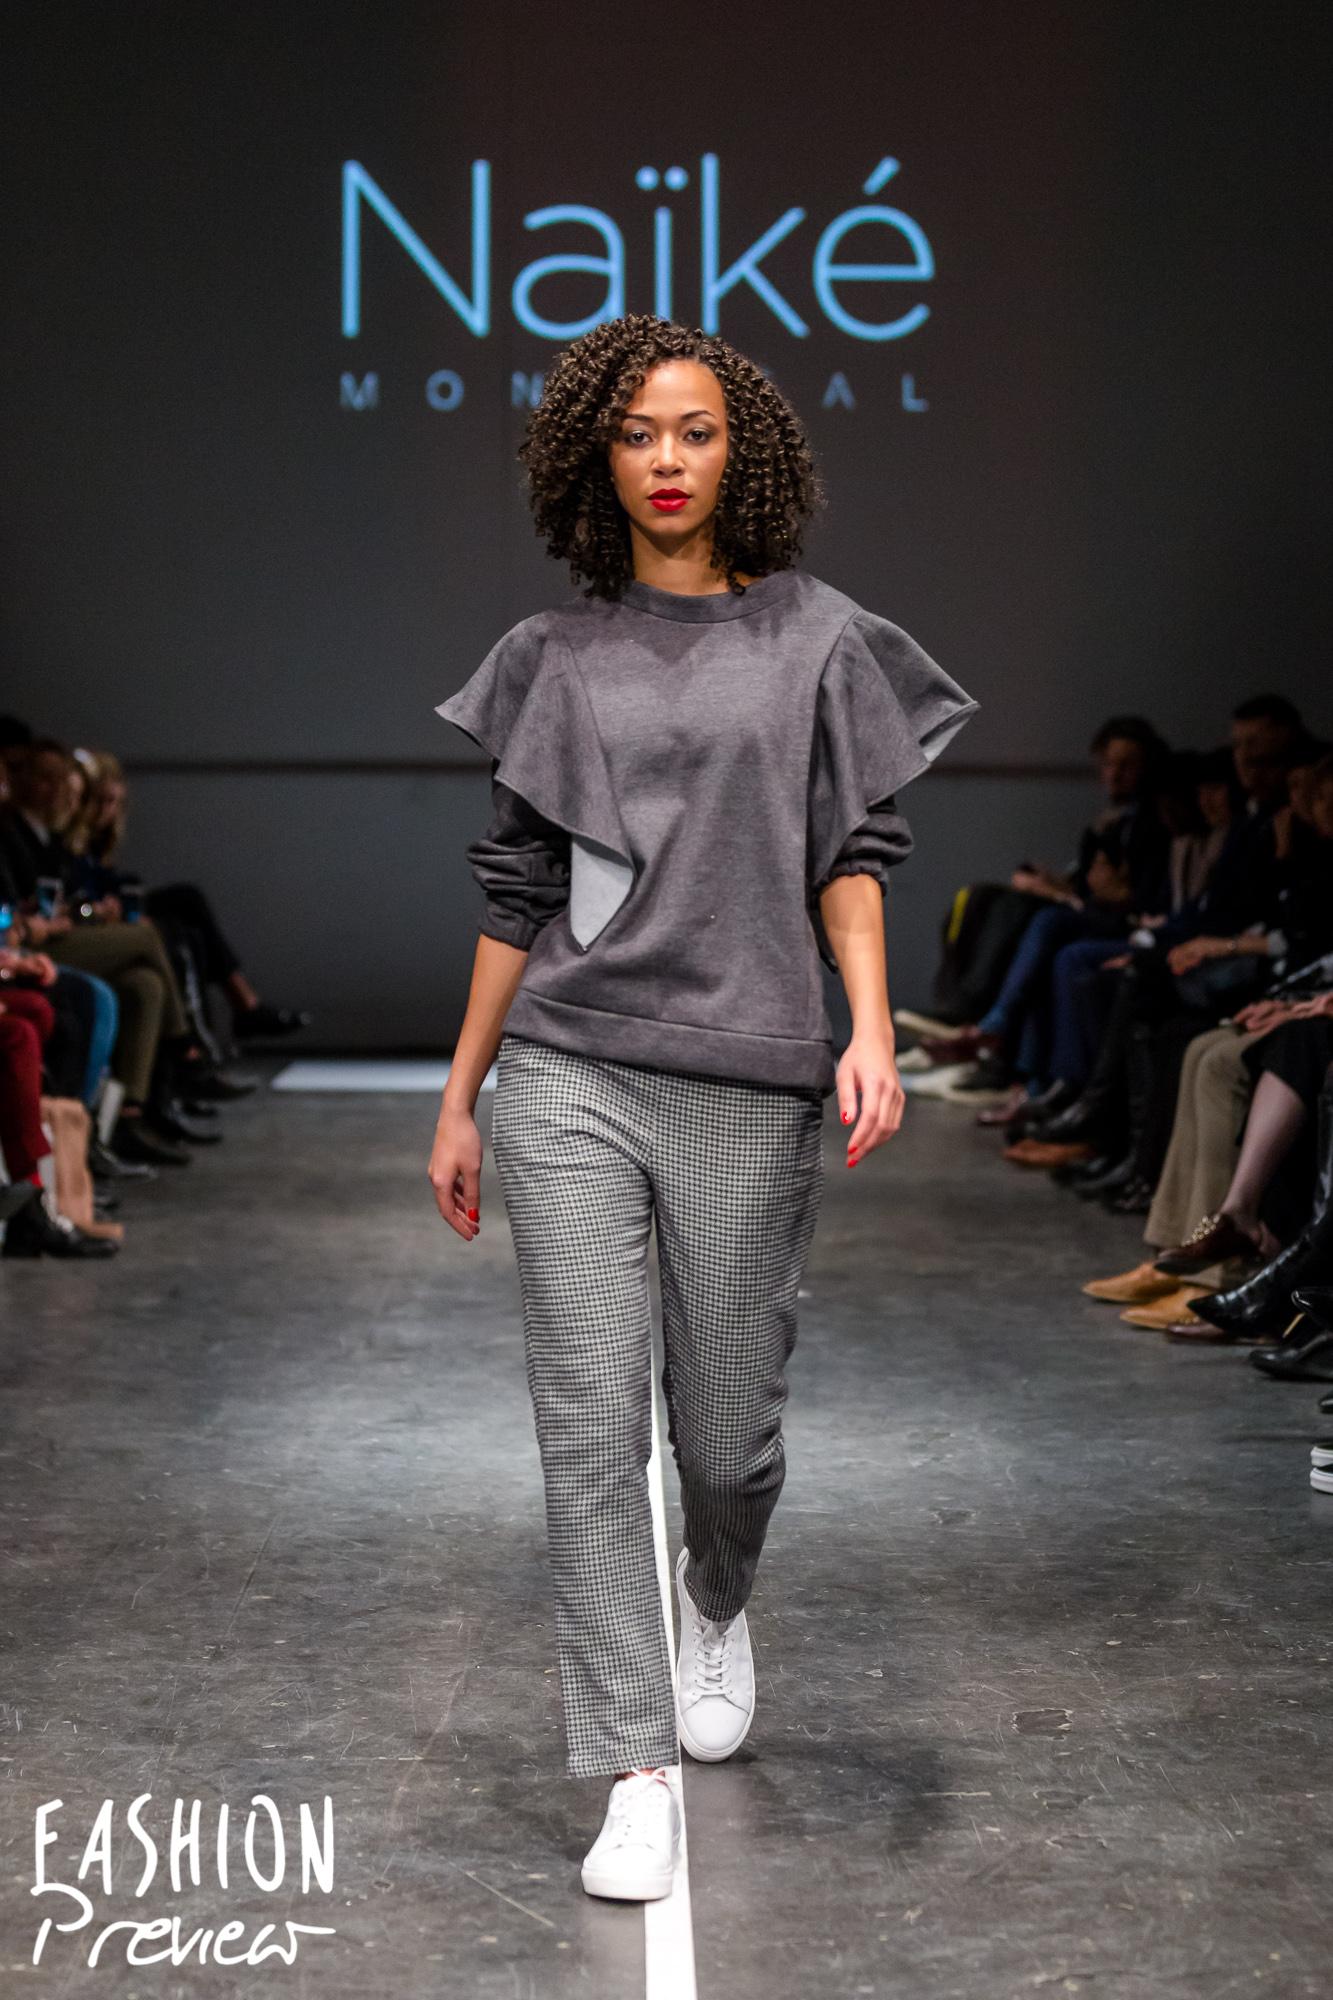 Fashion Preview 9 - Naike-21.jpg